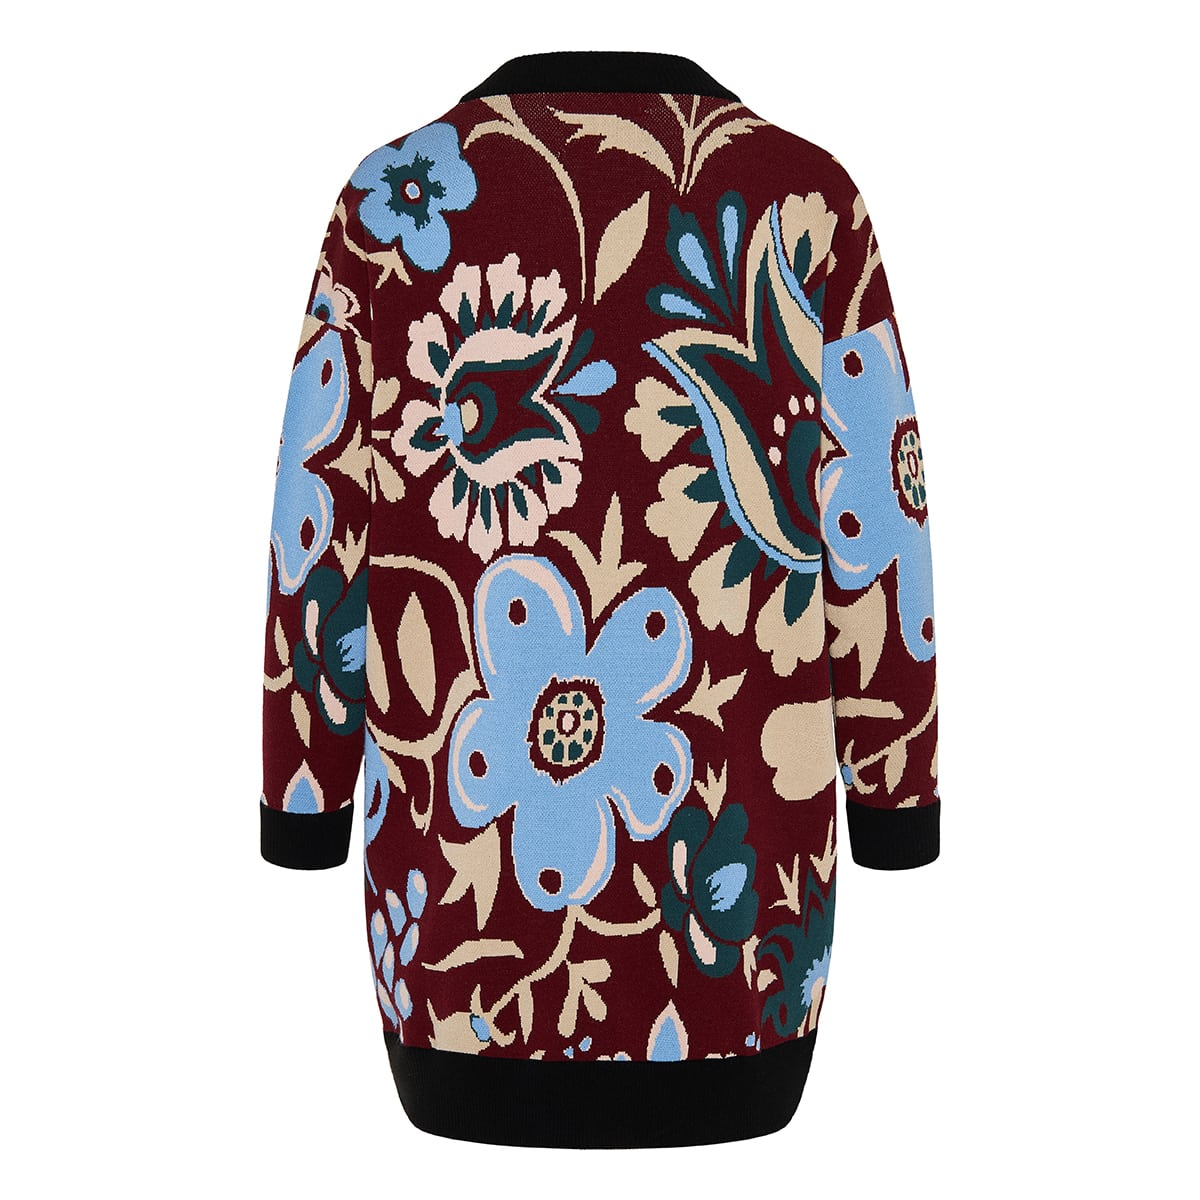 Bowling floral jacquard cardigan